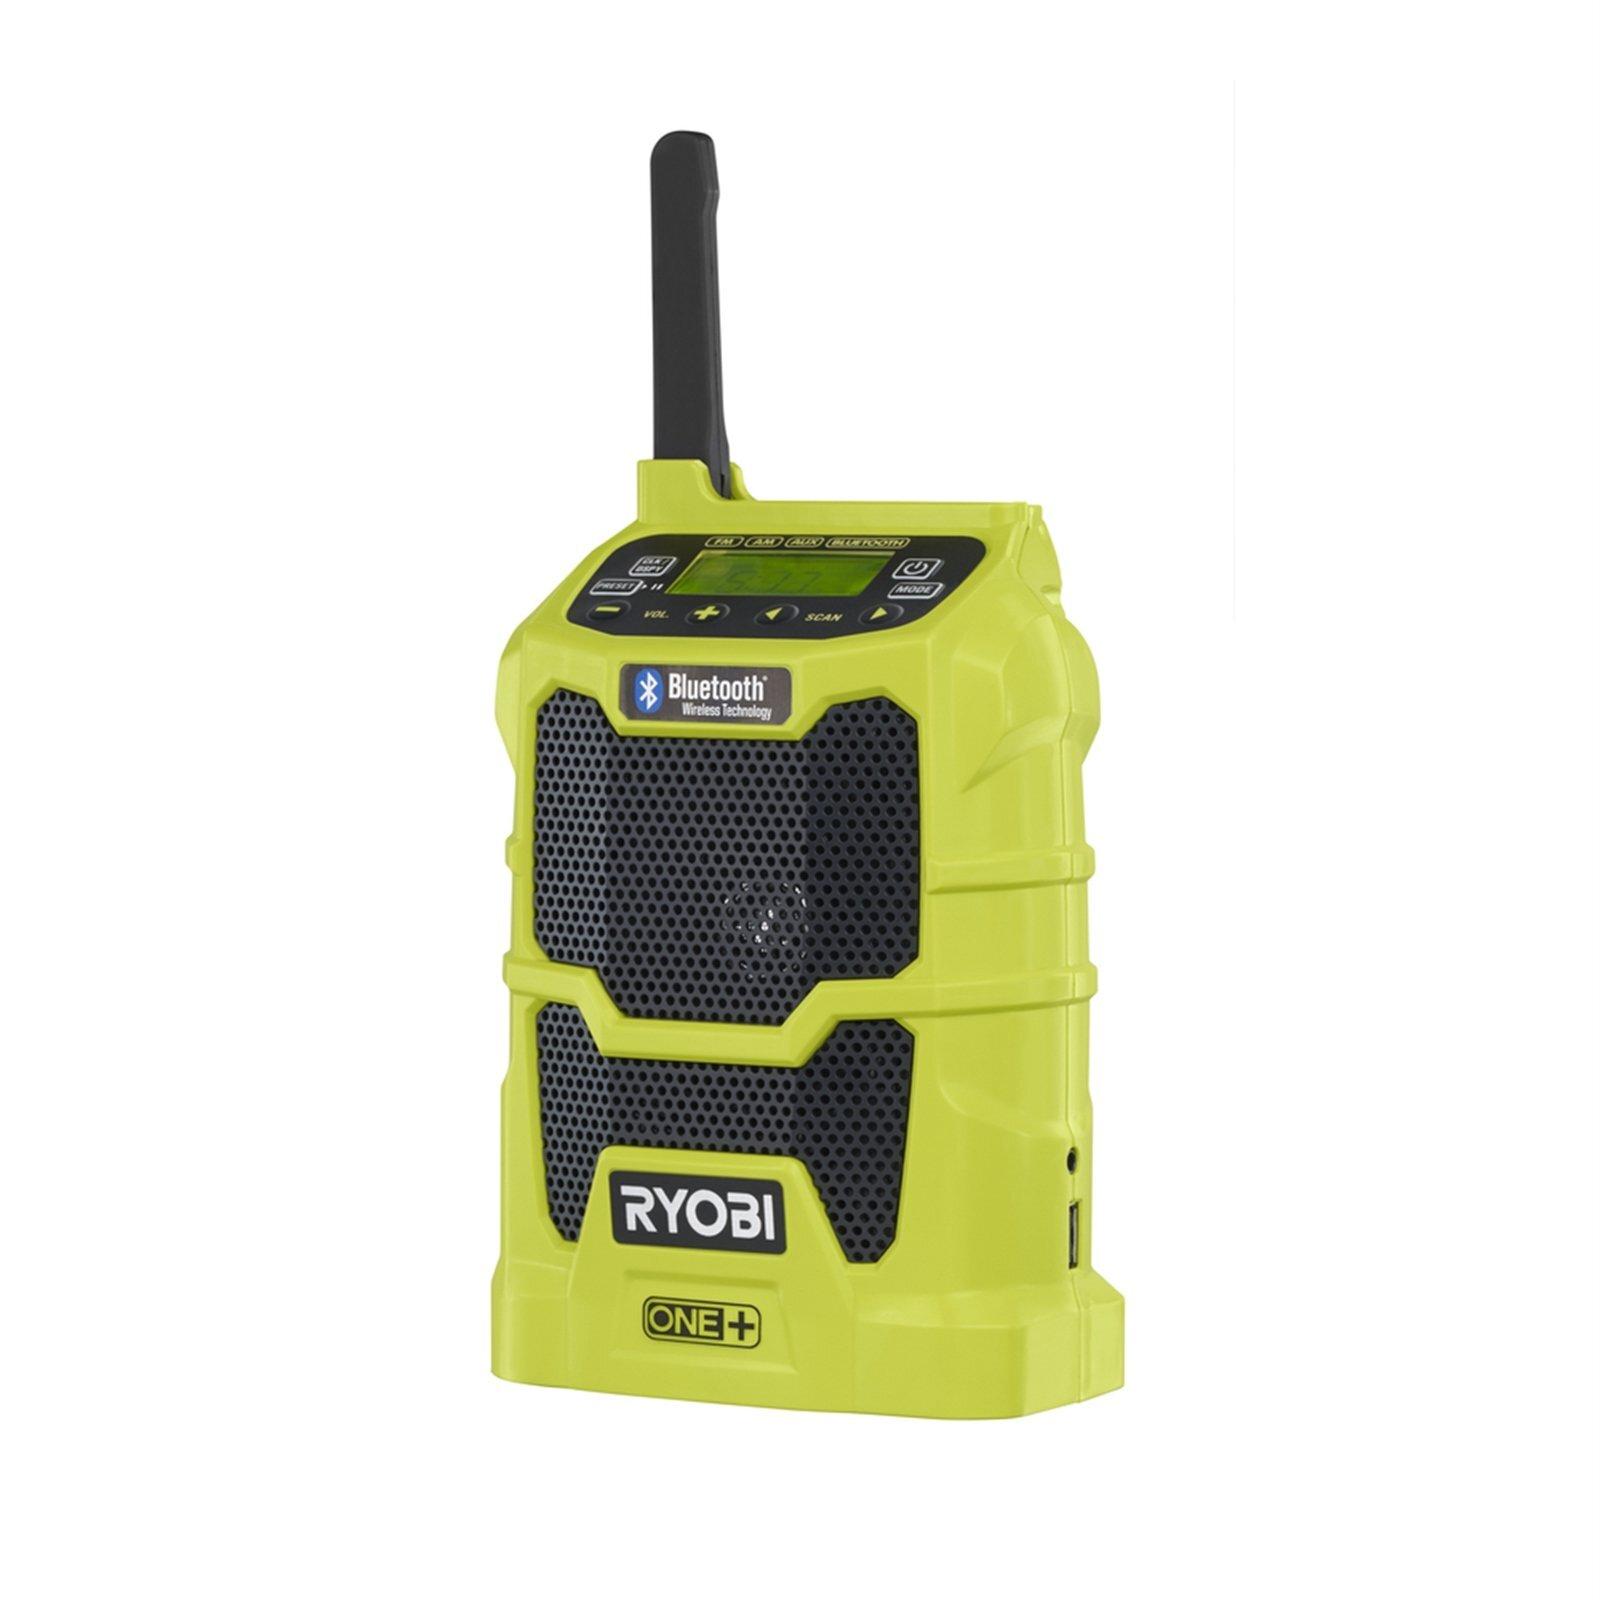 Ryobi ONE+ 18V AM/FM Radio with Bluetooth - Skin Only